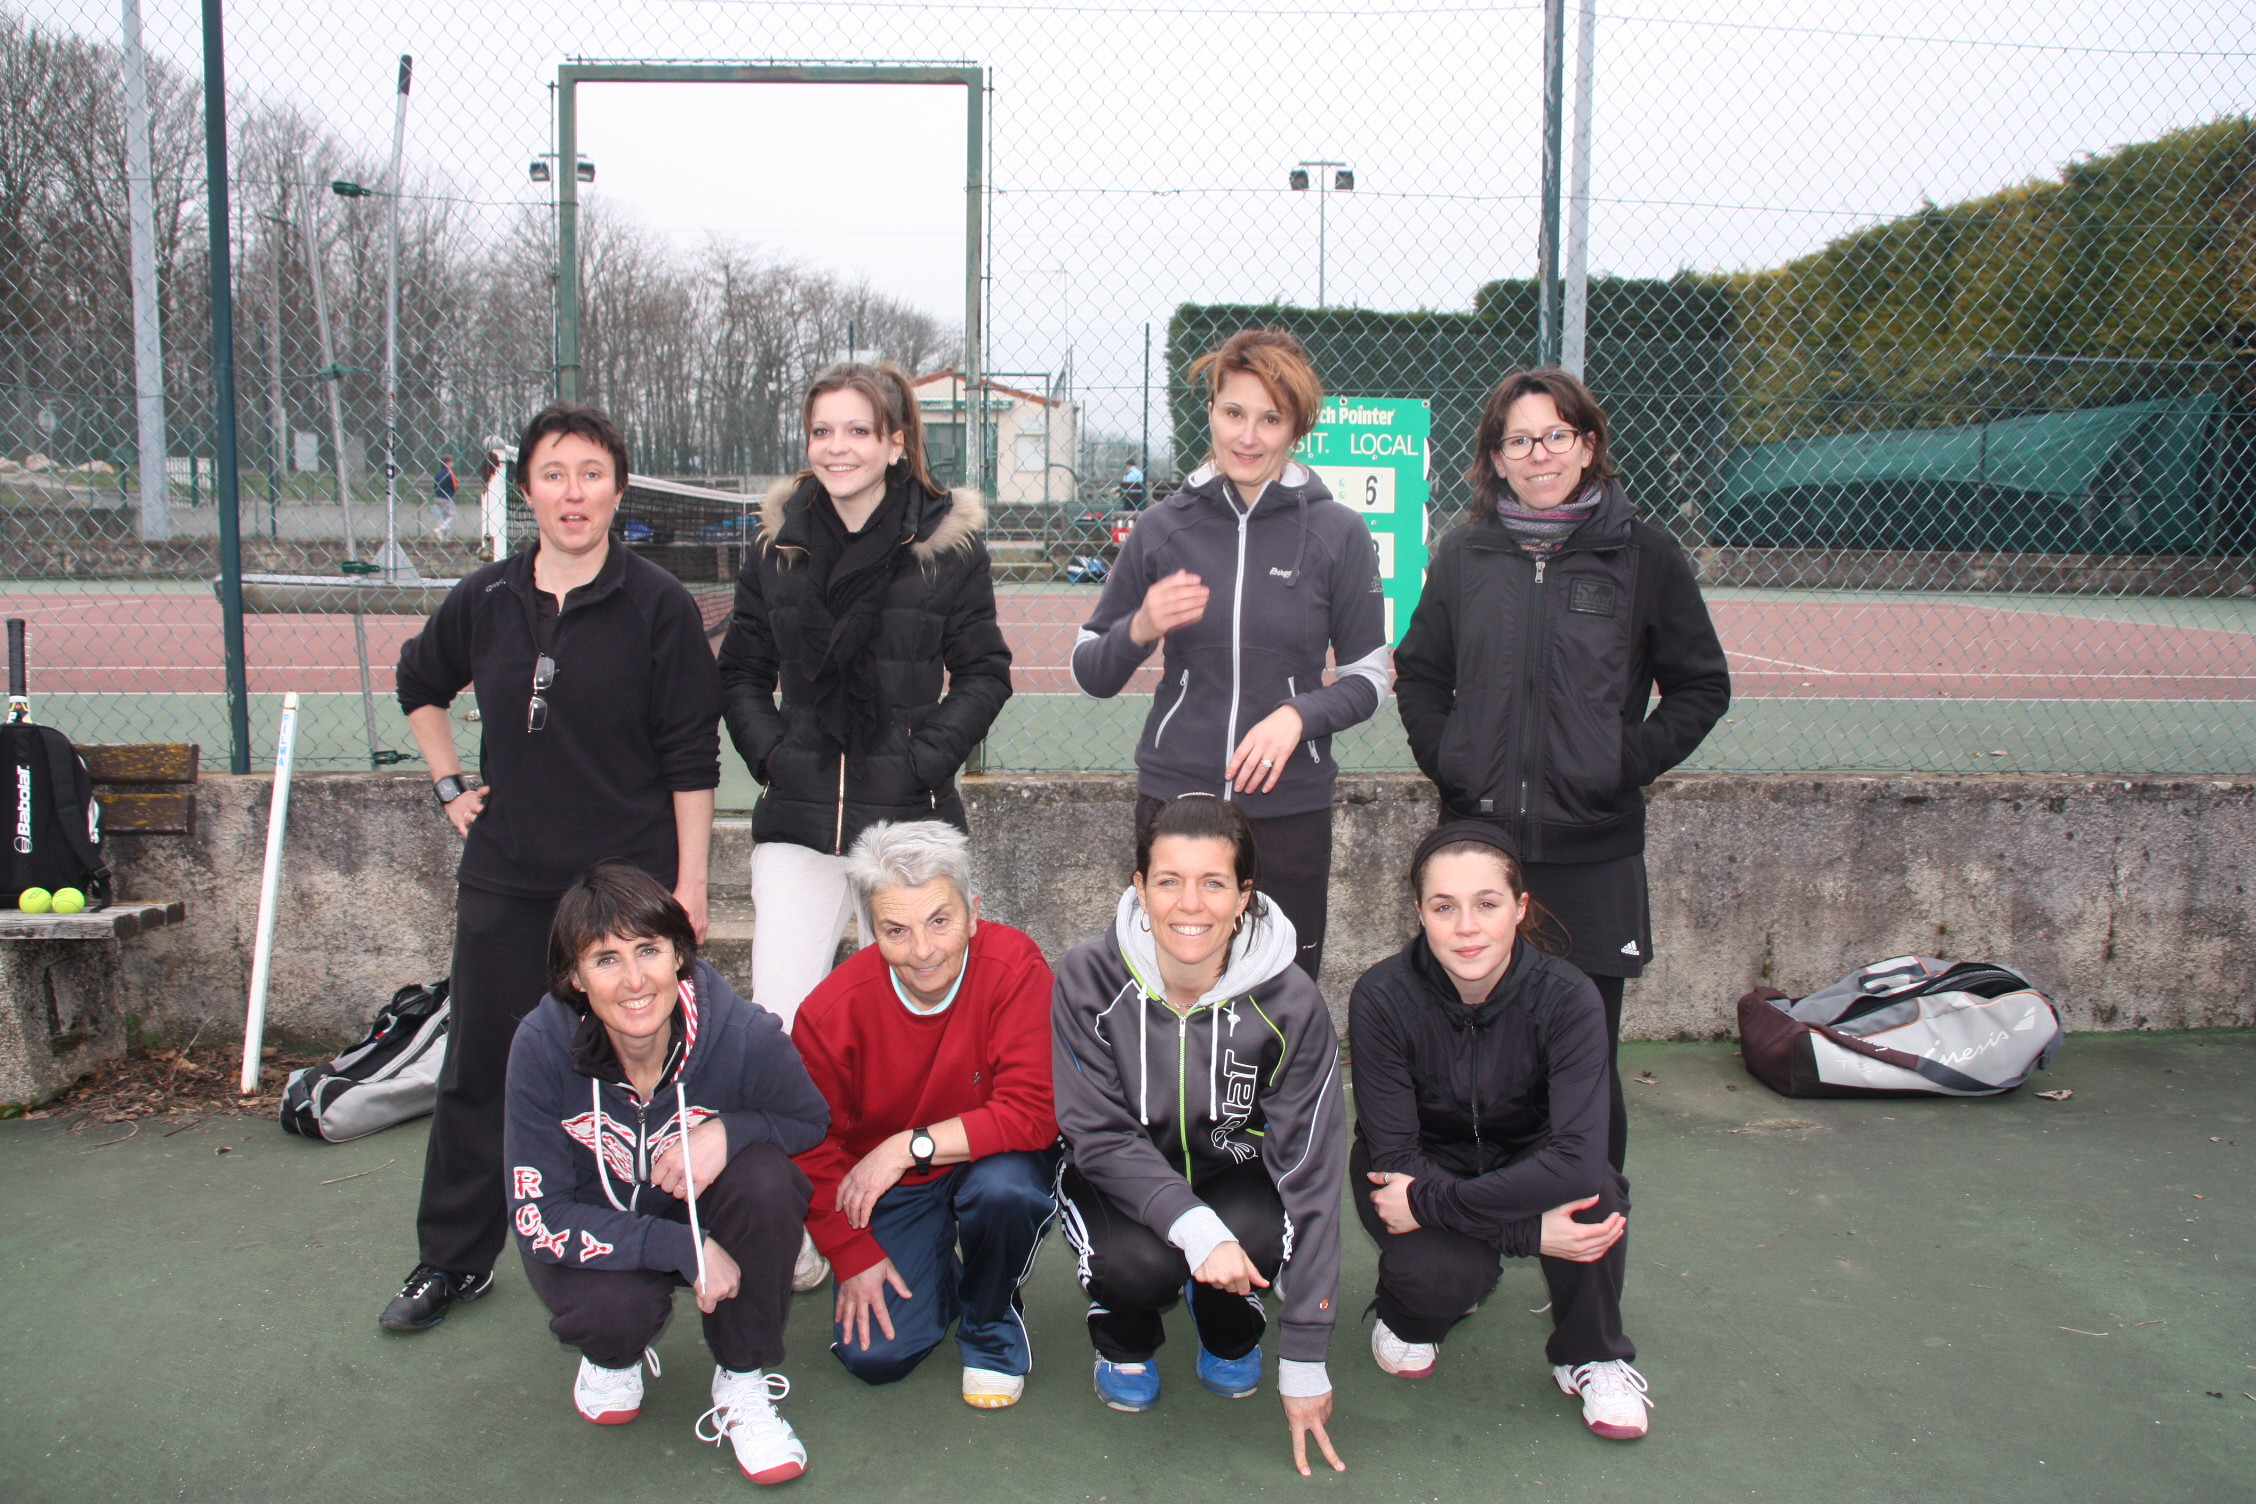 http://staff.clubeo.com/uploads/tennis-sathonay-village/Medias/Sathonay-_Solaize.JPG